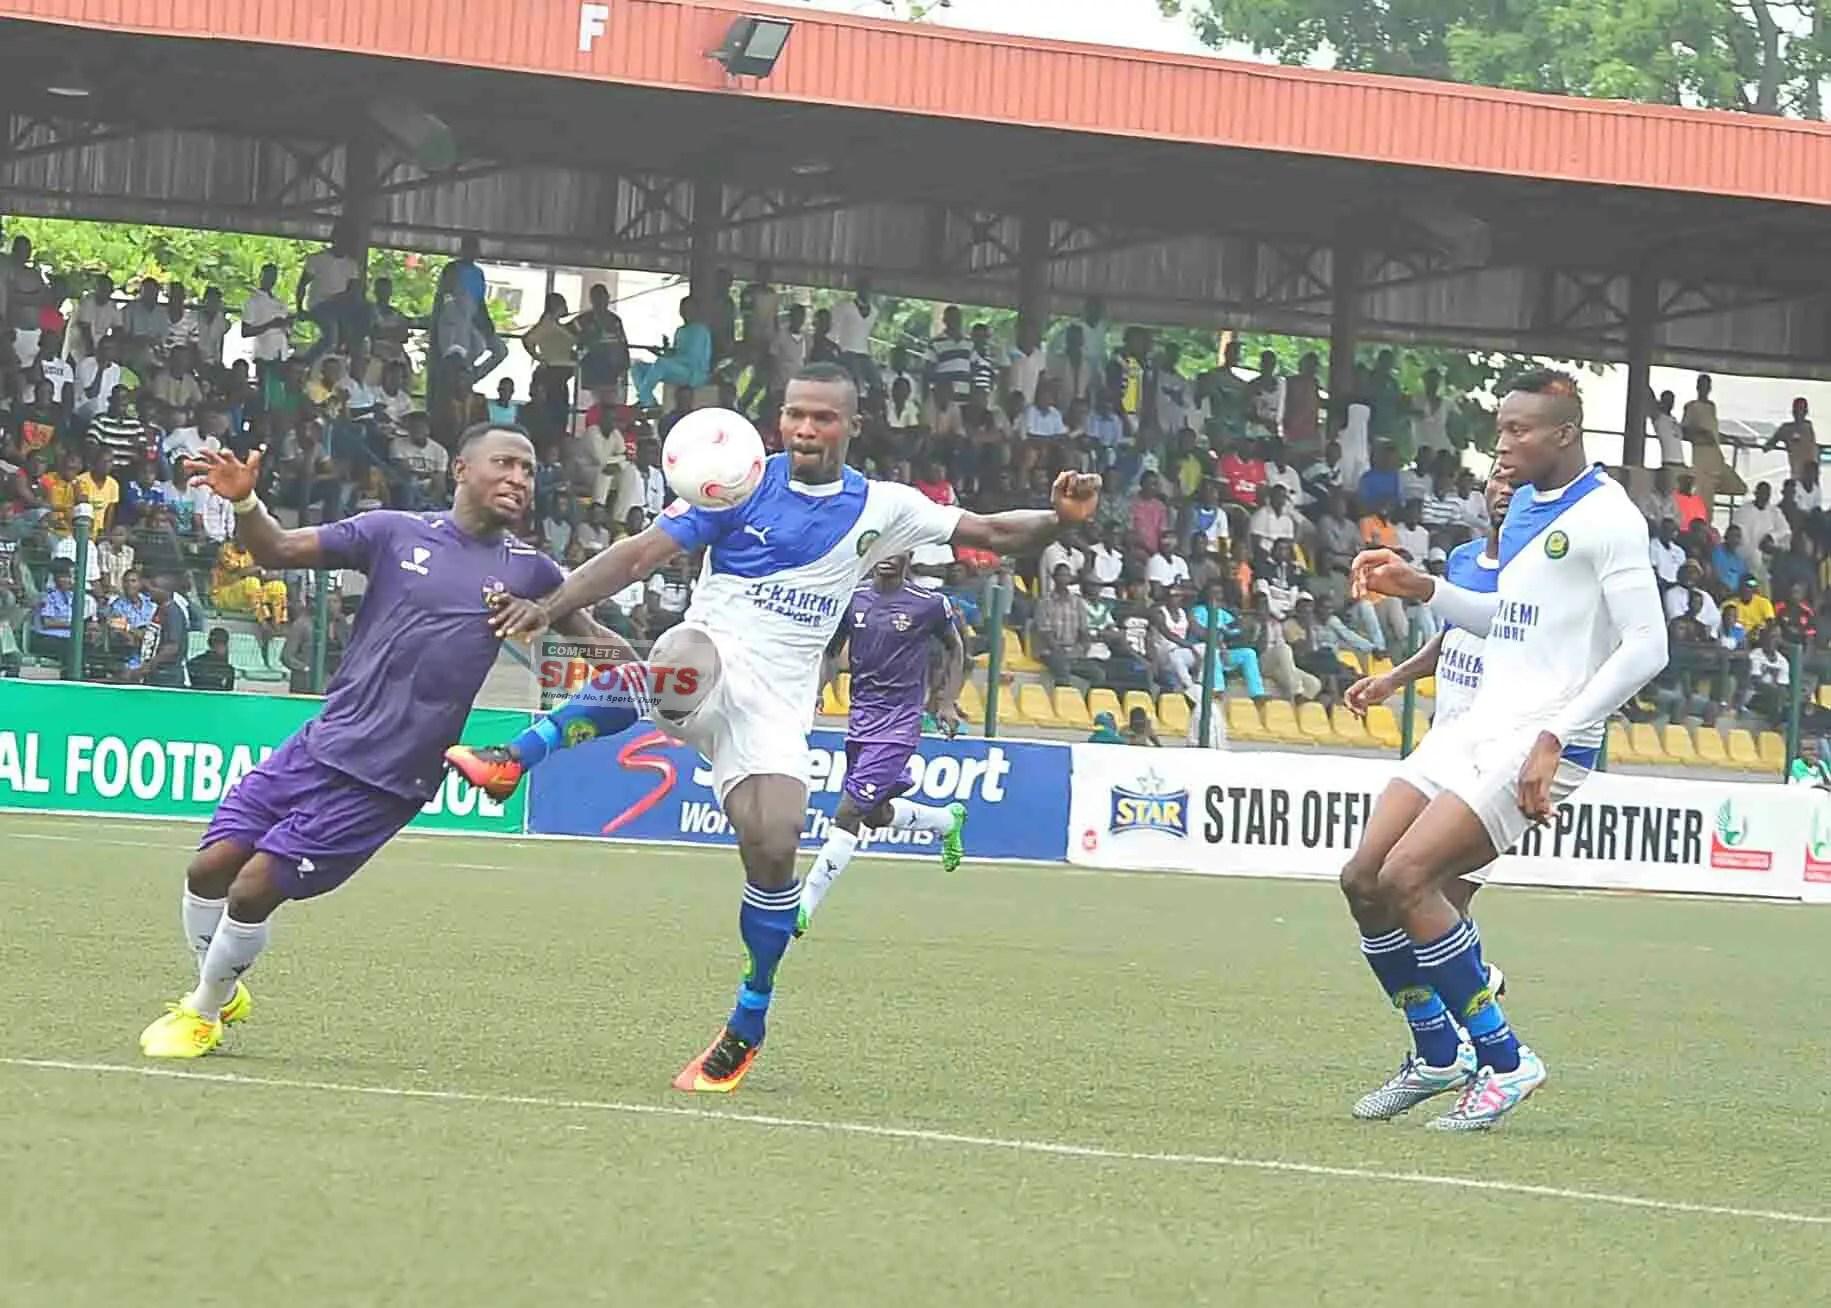 Akwa United Host Ambitious MFM At Akpabio Stadium Fortress; Plateau Eager To Go Top With Win Over Katsina